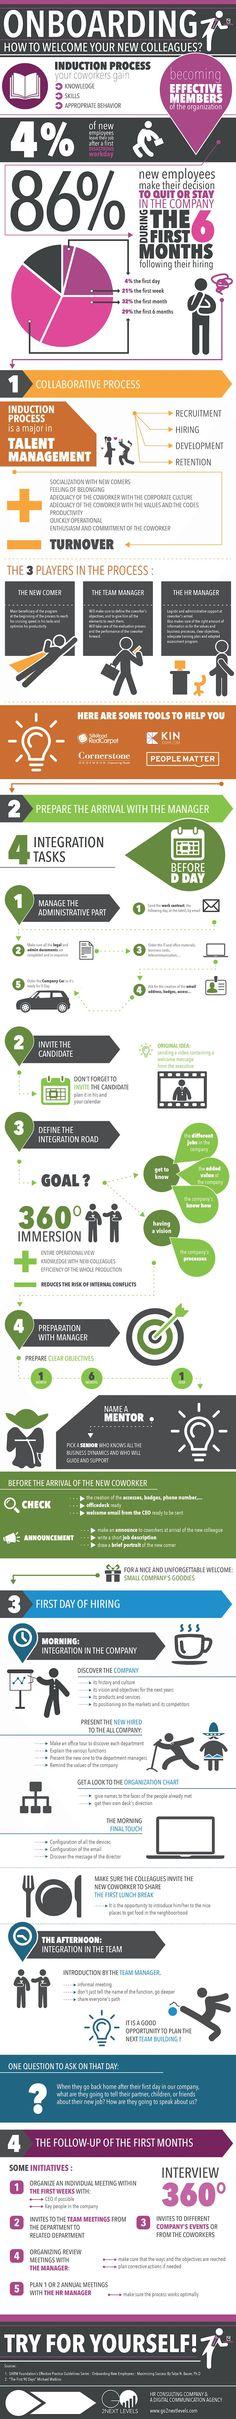 Employee onboarding infographic